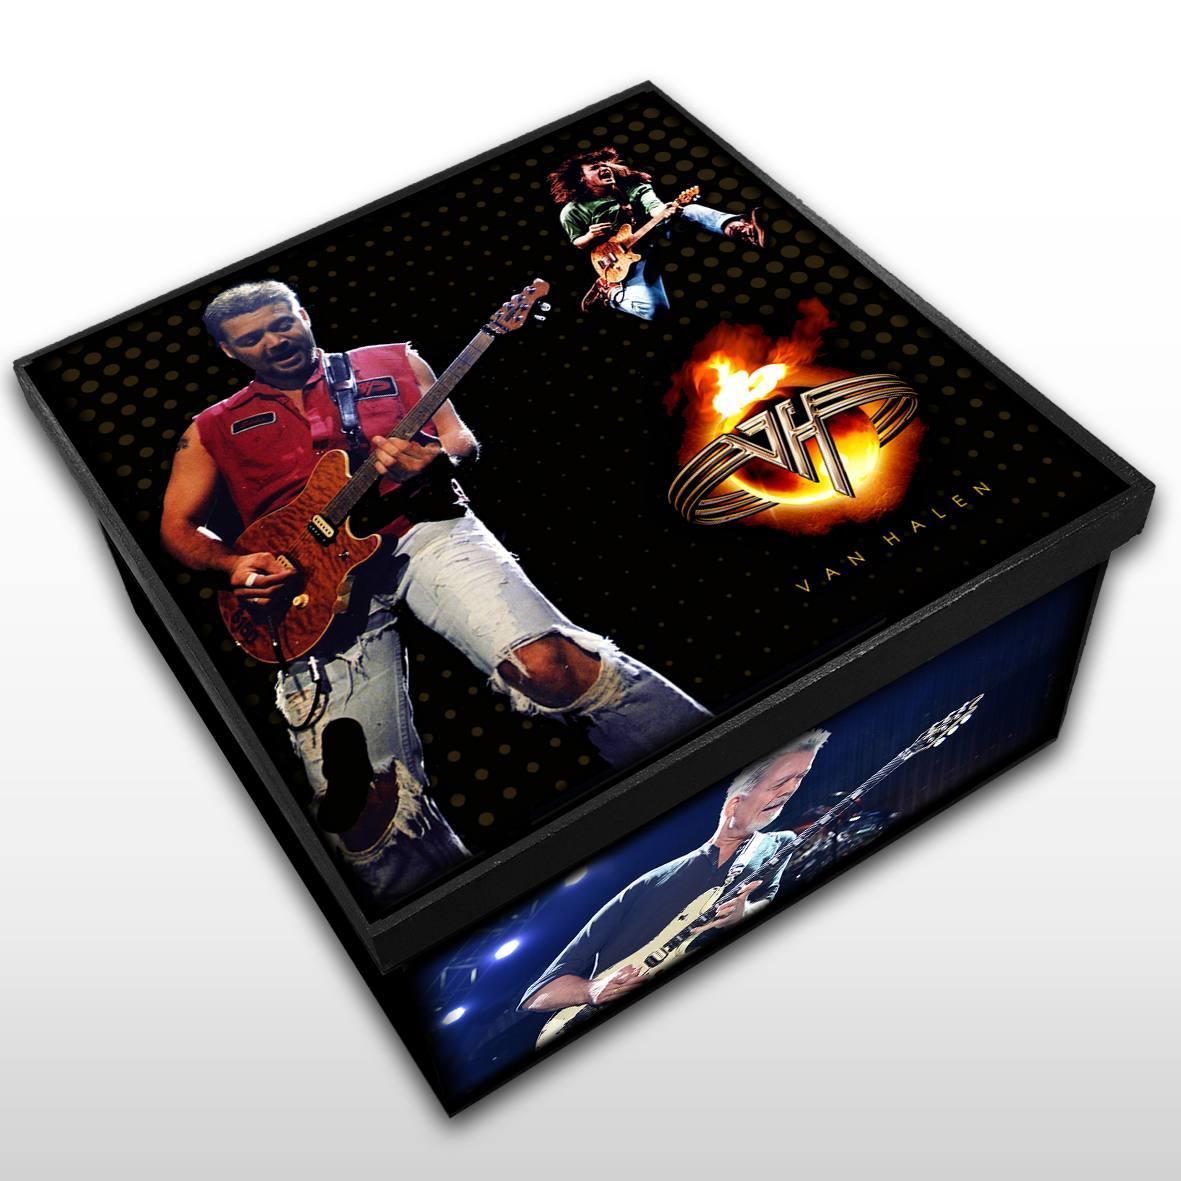 Van Halen - Caixa em Madeira MDF - Tamanho Médio - Mr. Rock